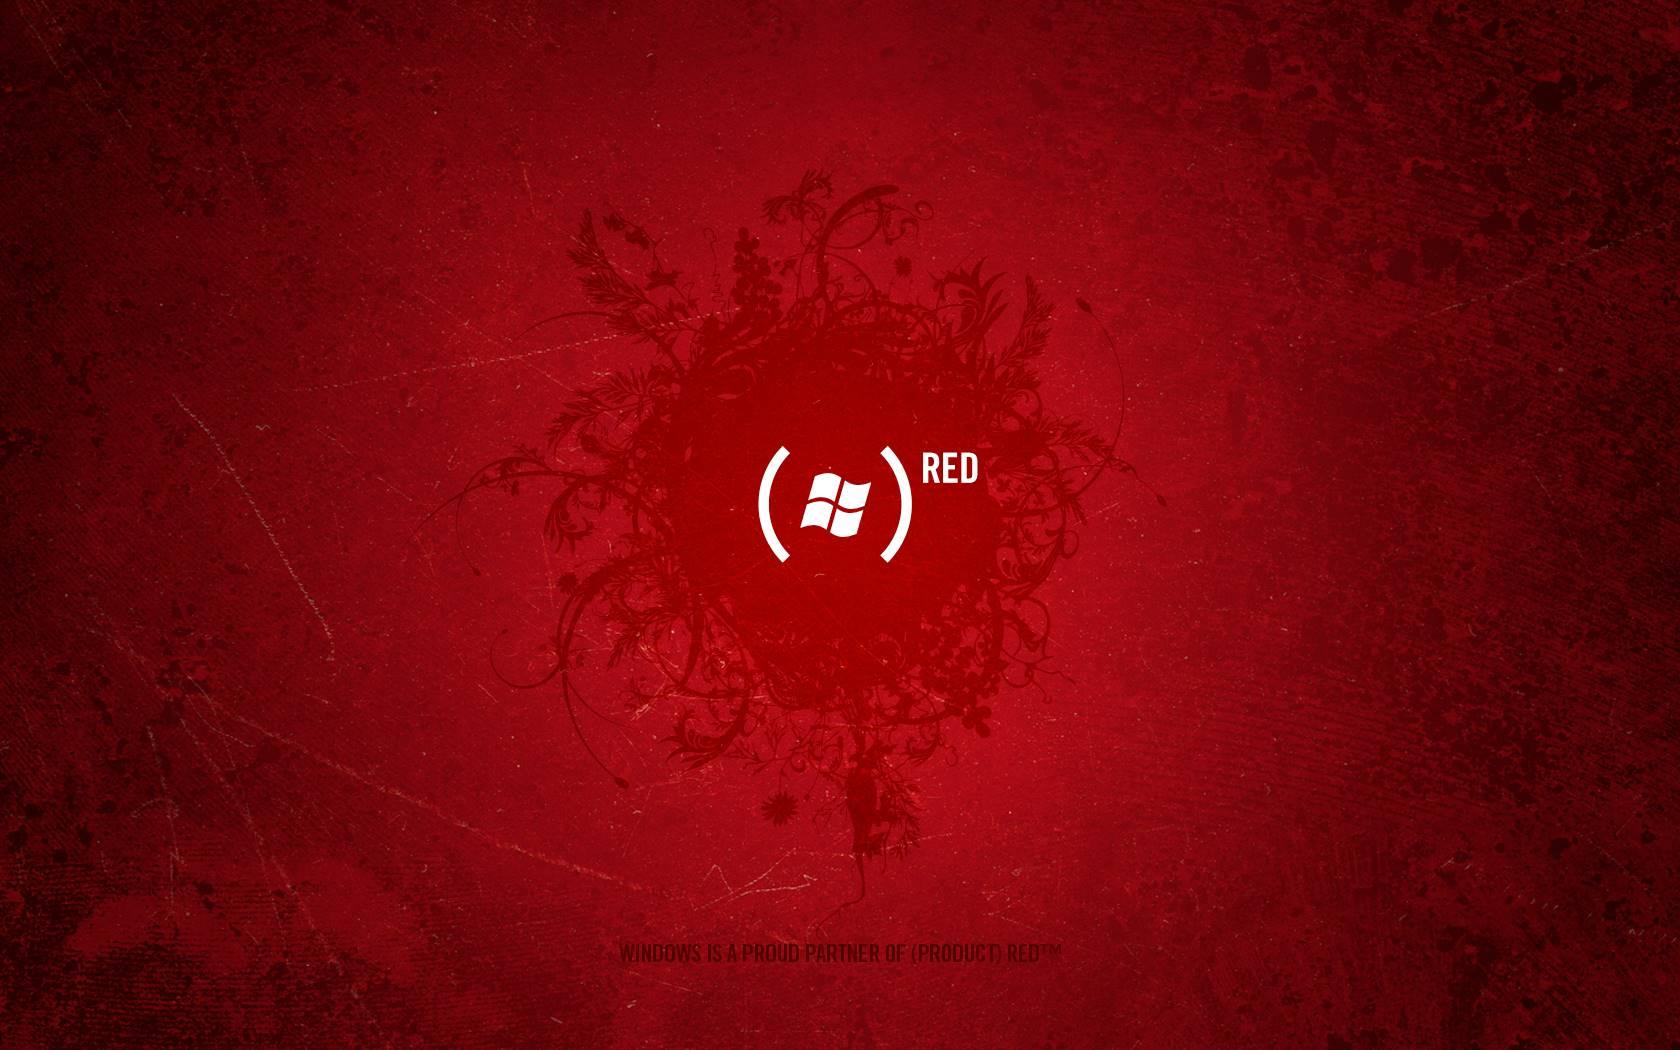 Red Desktop Backgrounds 1680x1050